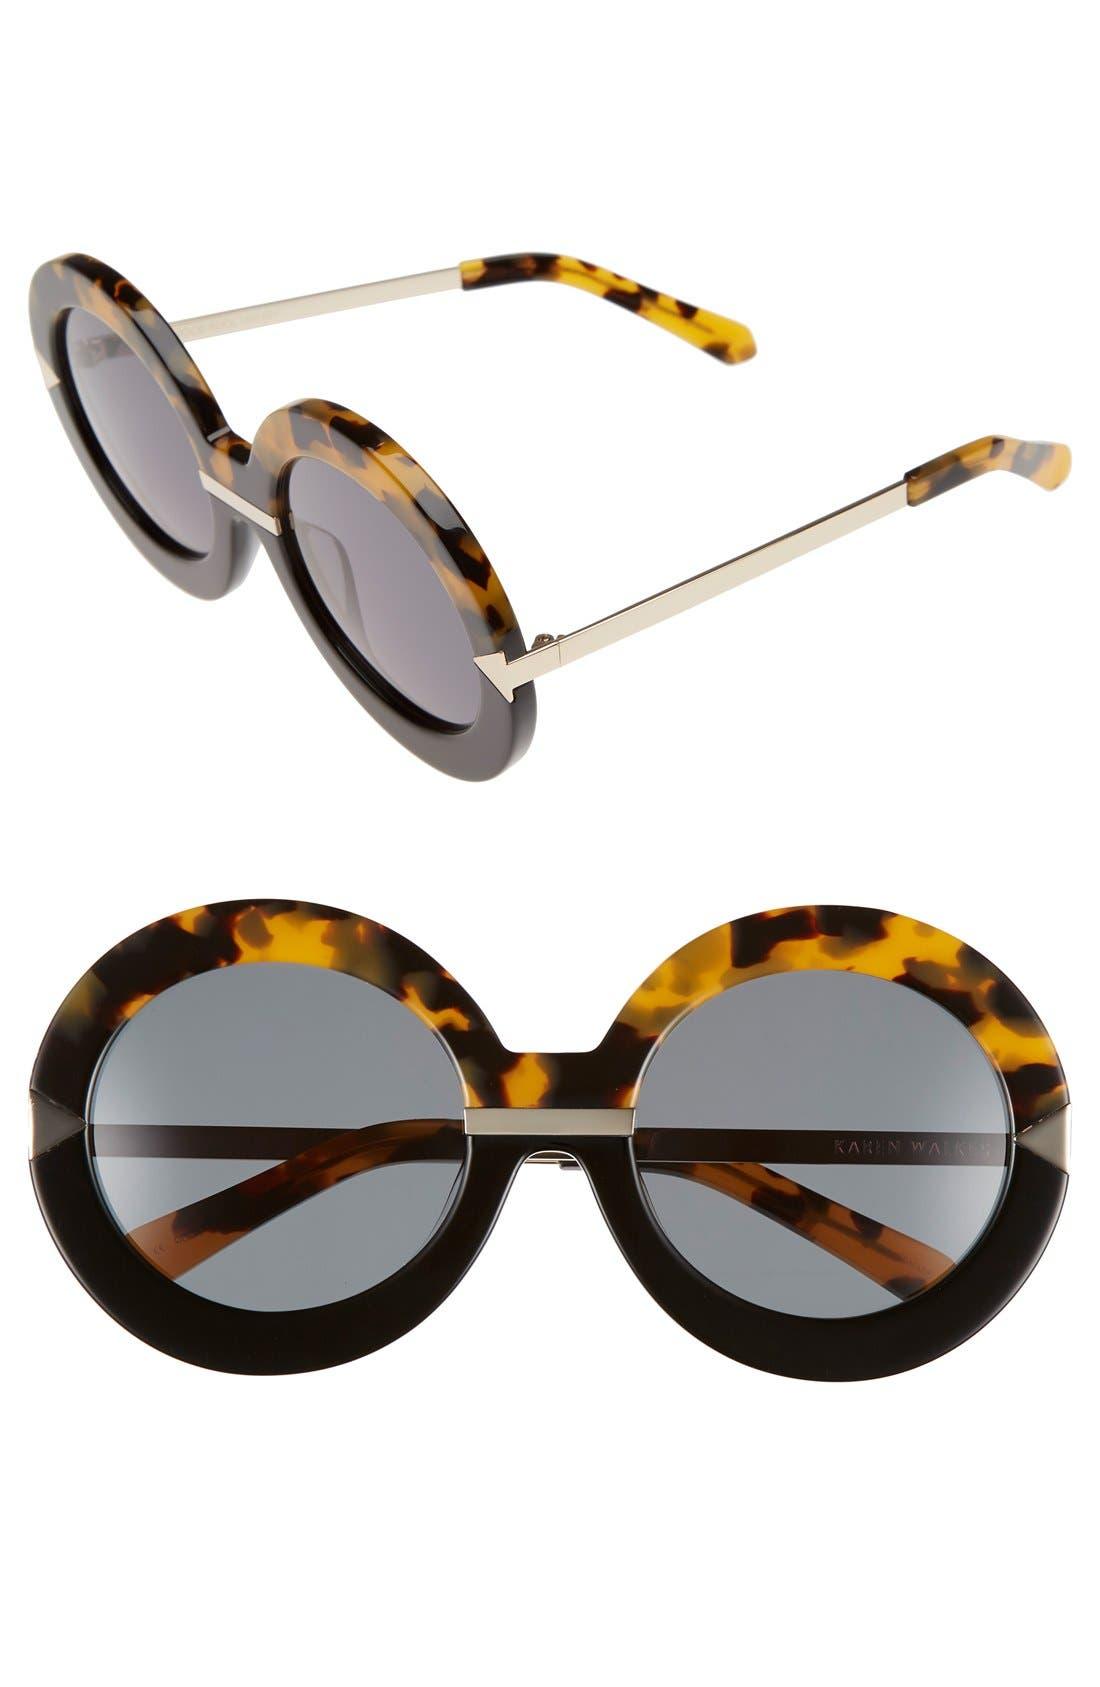 Main Image - Karen Walker 'Hollywood Pool - Arrowed by Karen' 53mm Sunglasses